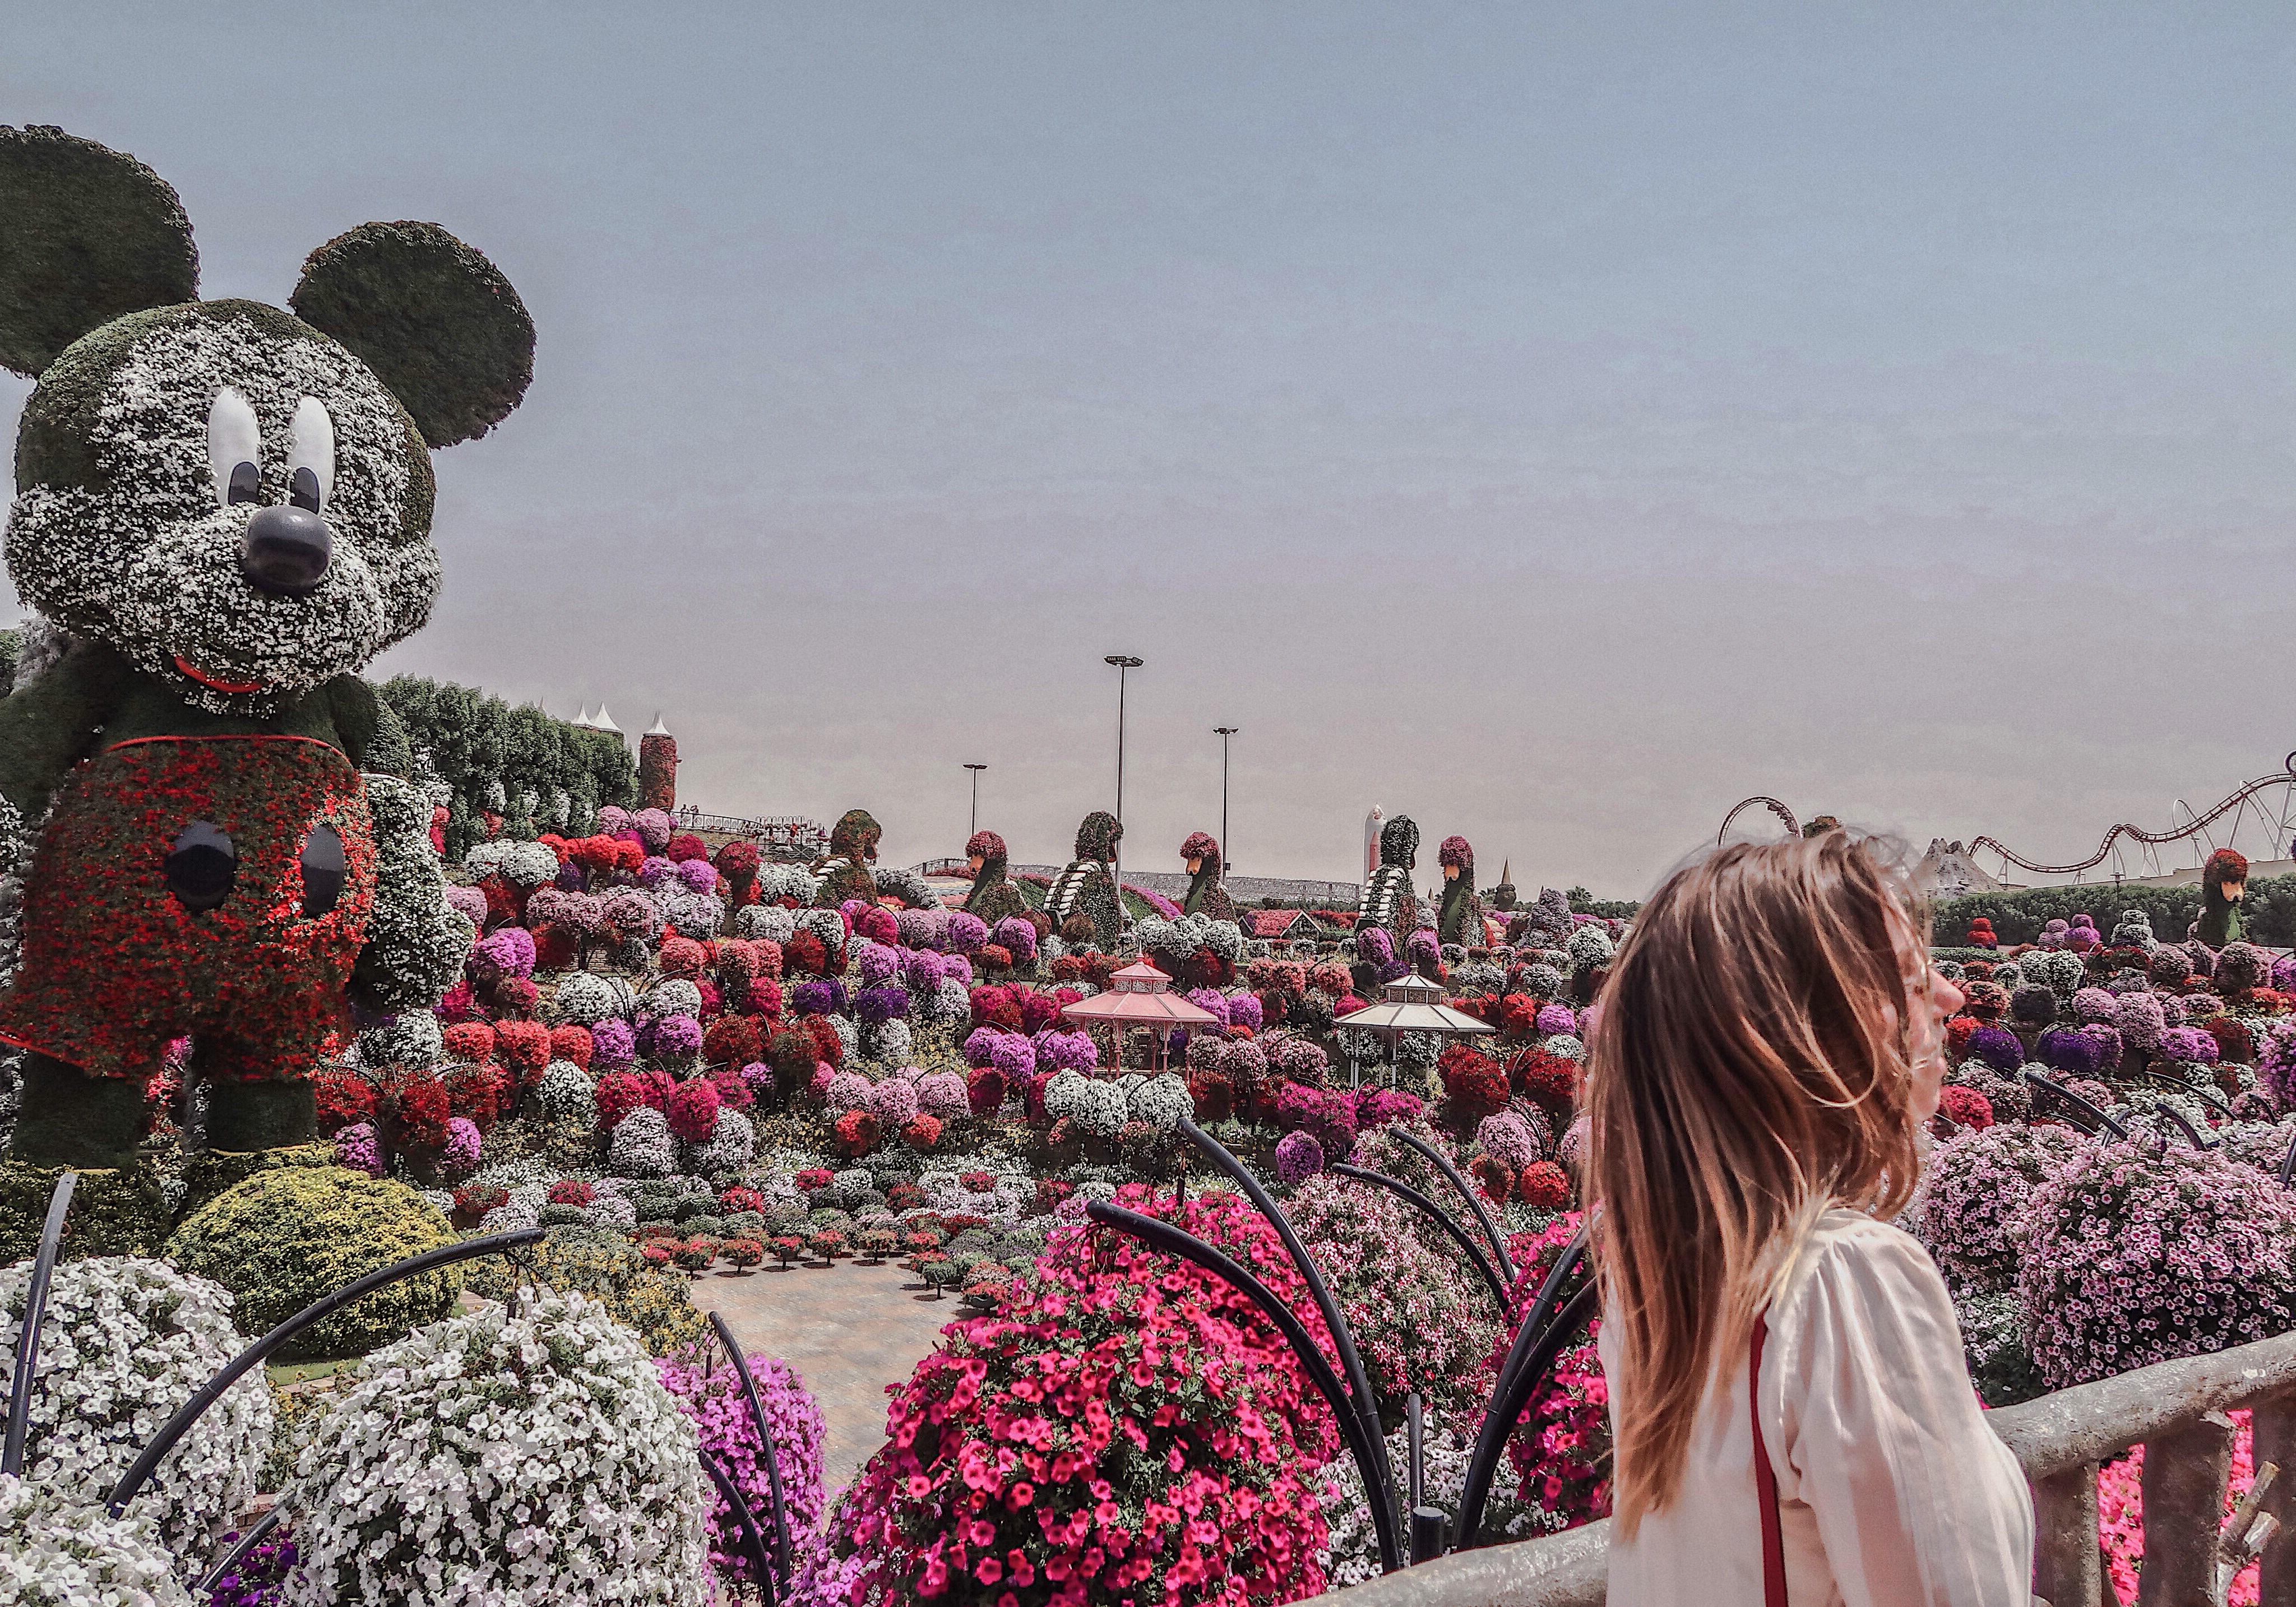 Shoppinator-Dubai-Travel-Guide-Reise-Tipps-Hotel-Hoteltipp-Miracle-Garden-Blogger-Bilder-Instagram-instagrammable-Burj-Khalifa-Burj-Al-Arab-Mövenpick-IBN-Battuta-Movenpick-Hotel-Review-Flowers-Blumengarten-Hot-Spots.JPG